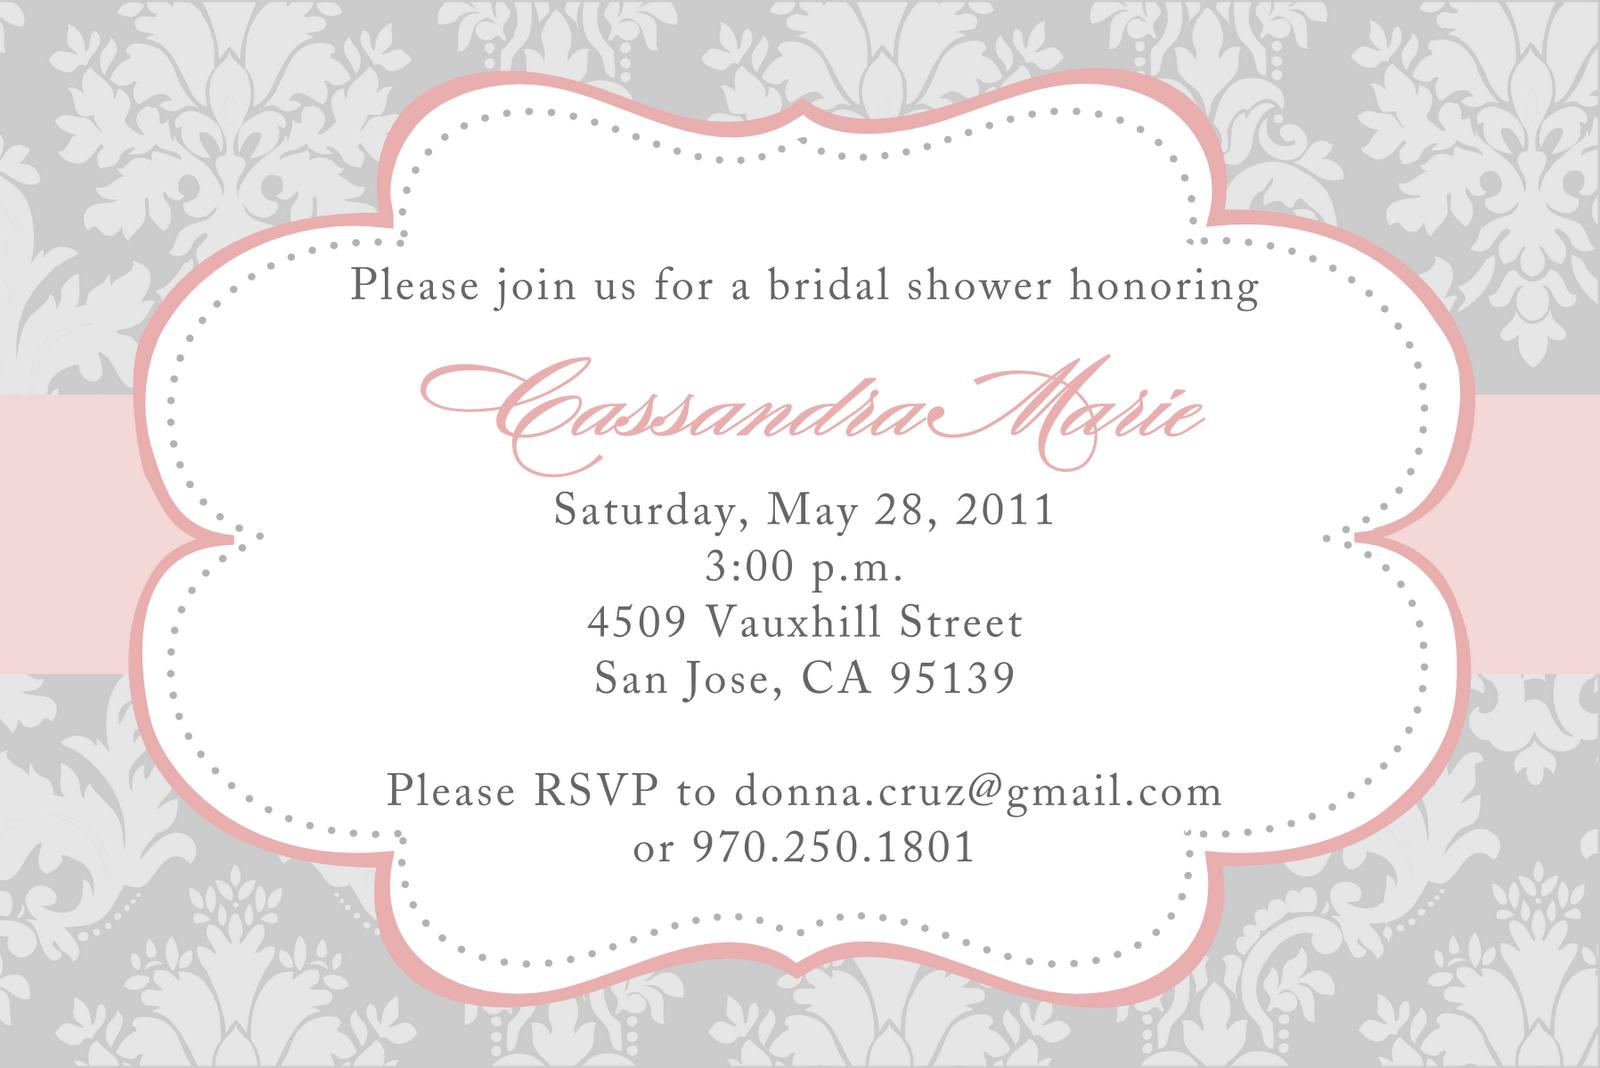 wedding shower invitation templates free | Bridesmaids stuff ...